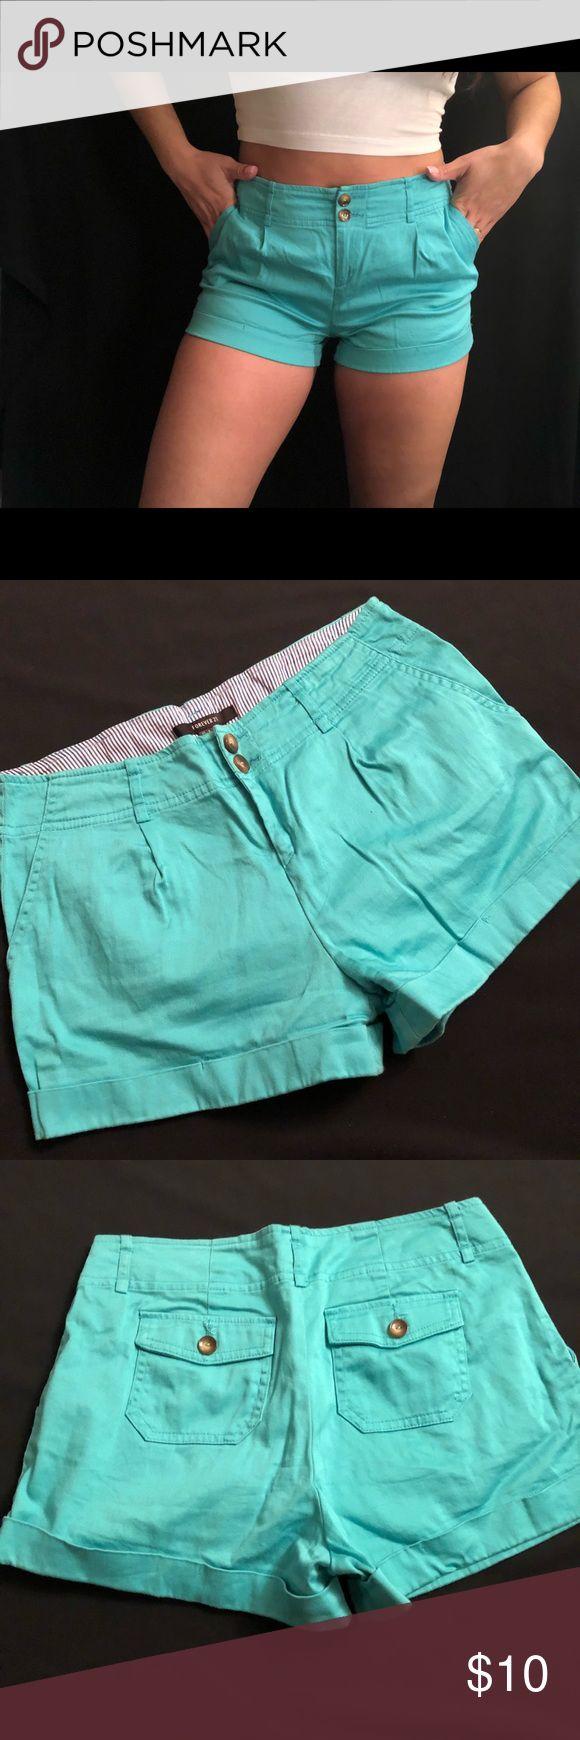 Teal shorts with pockets Teal shorts with pockets Forever 21 Shorts